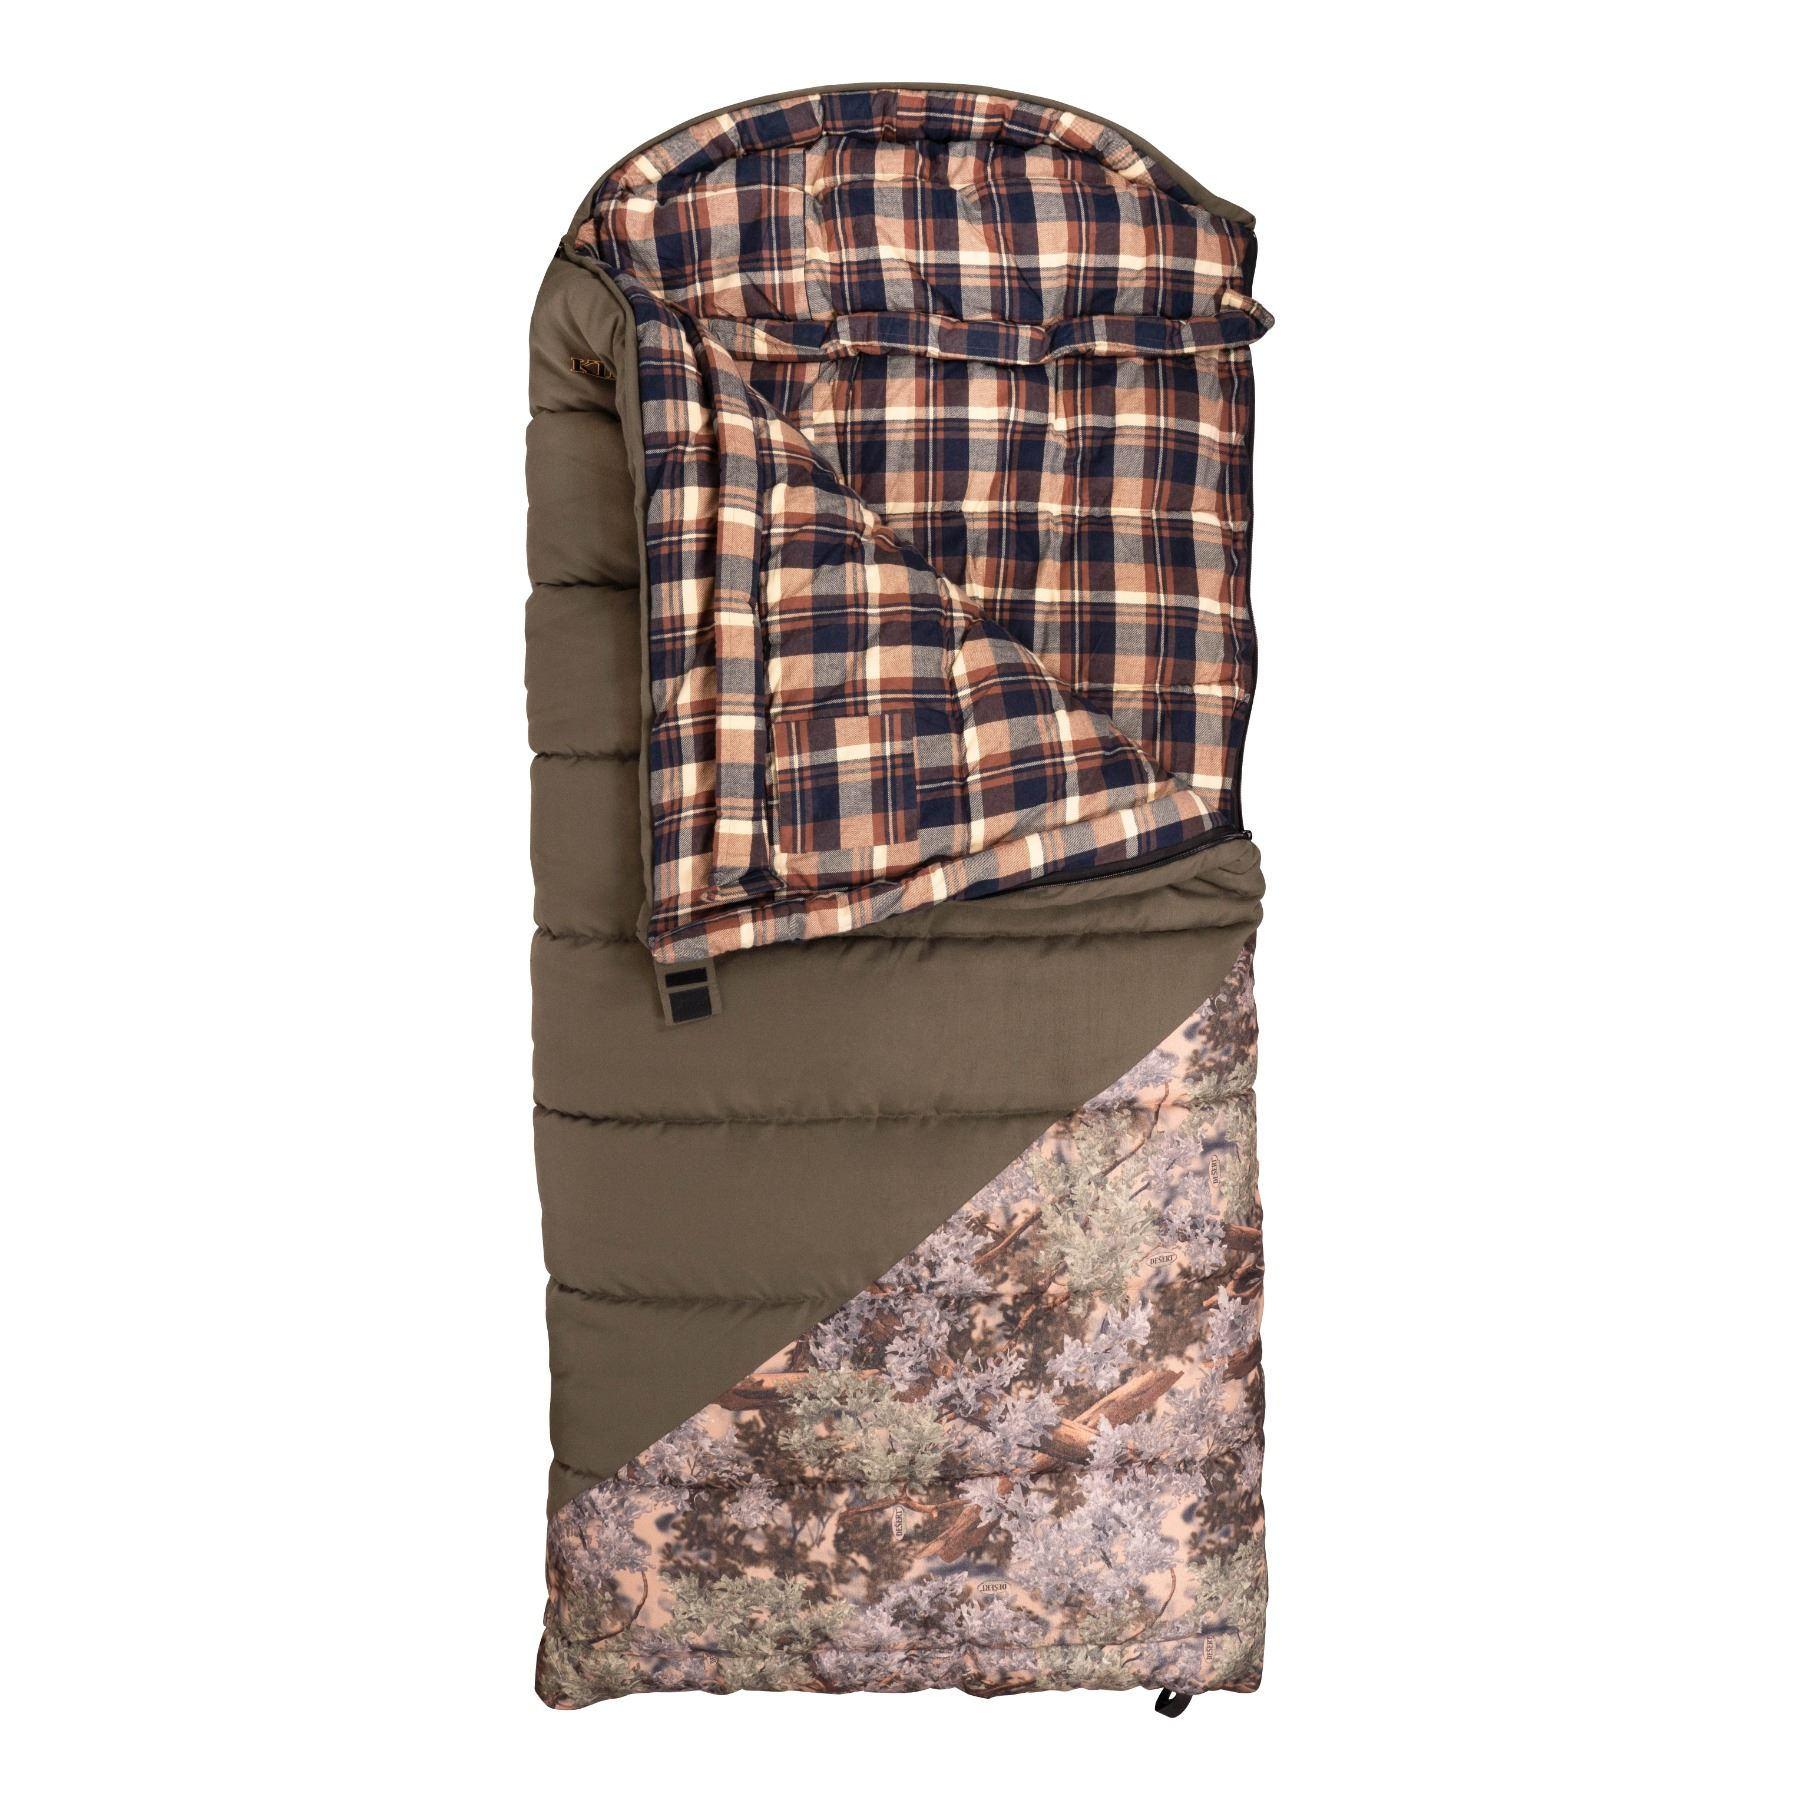 Hunter Series -35 Sleeping Bag from King's Camo